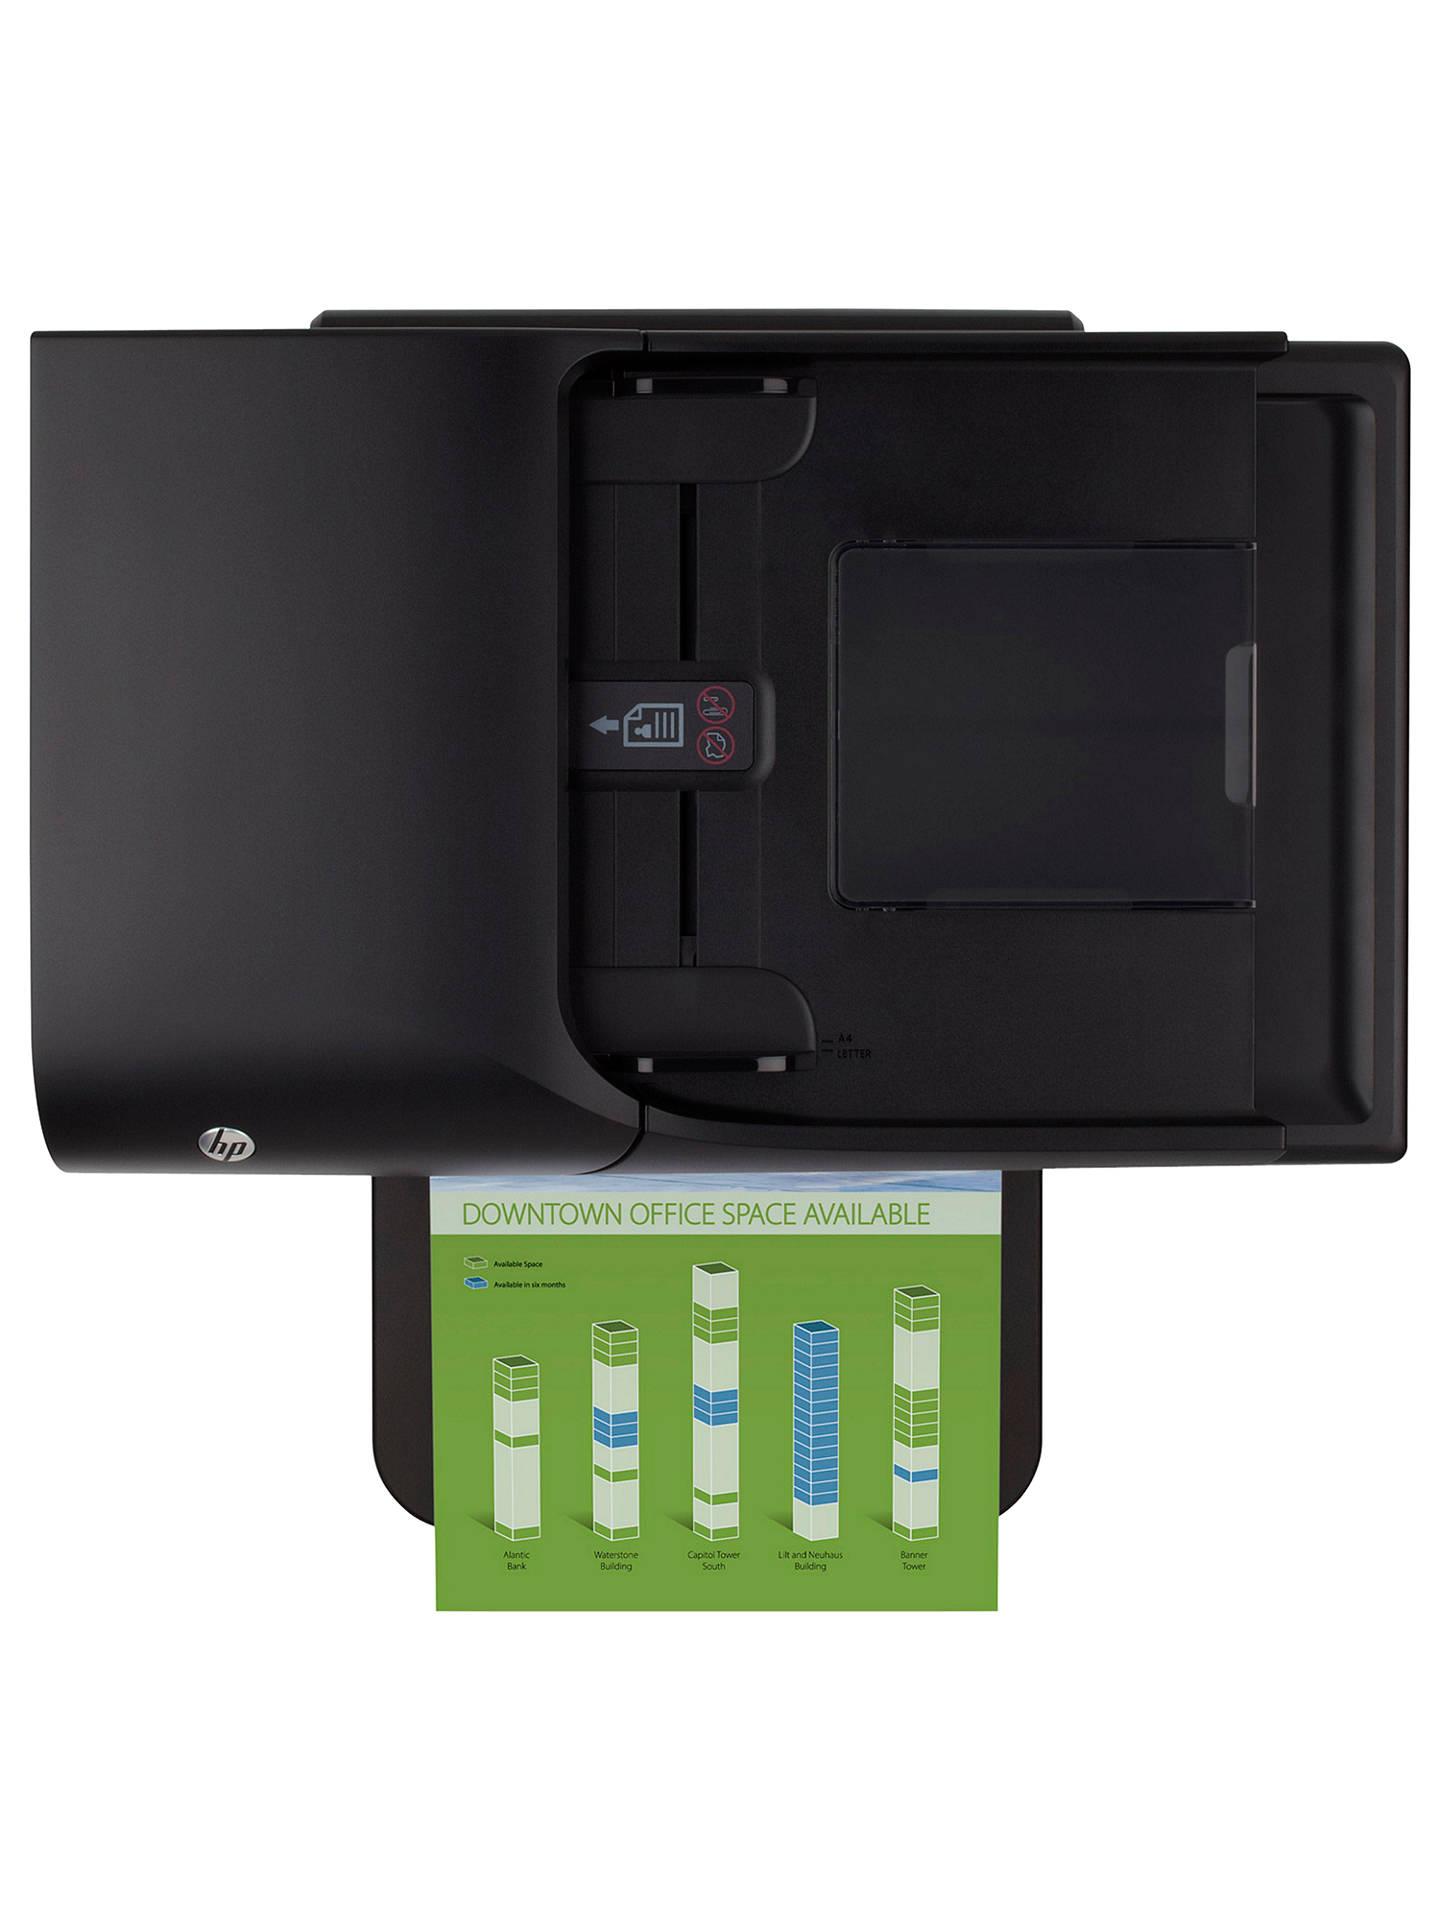 ... BuyHP Officejet Premium 6700 Wireless e-All-in-One Printer & Fax Machine